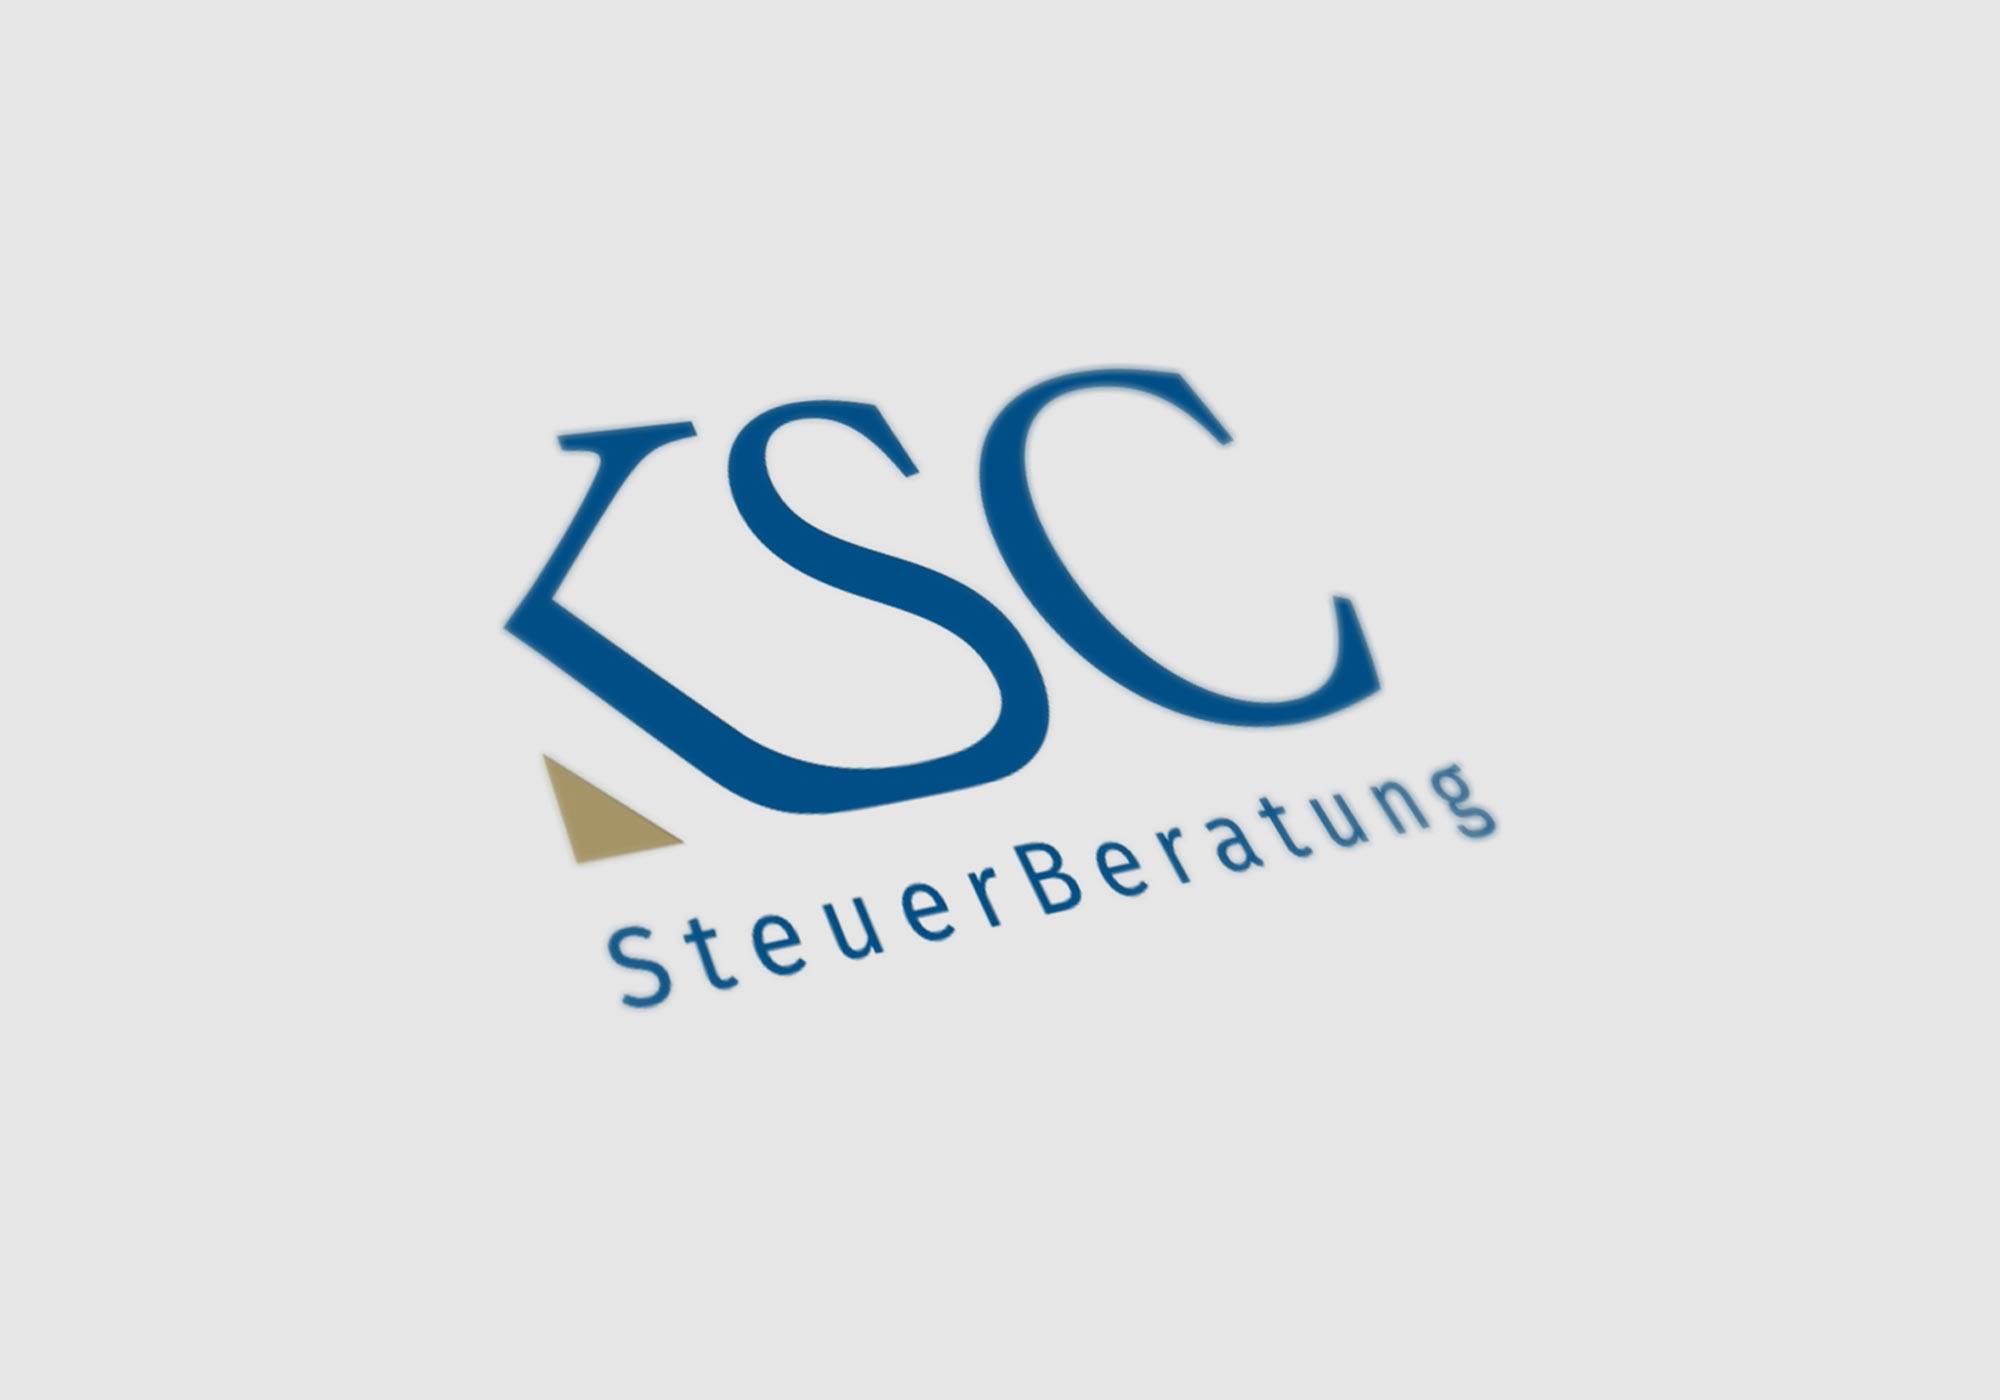 001_KSC_Logo